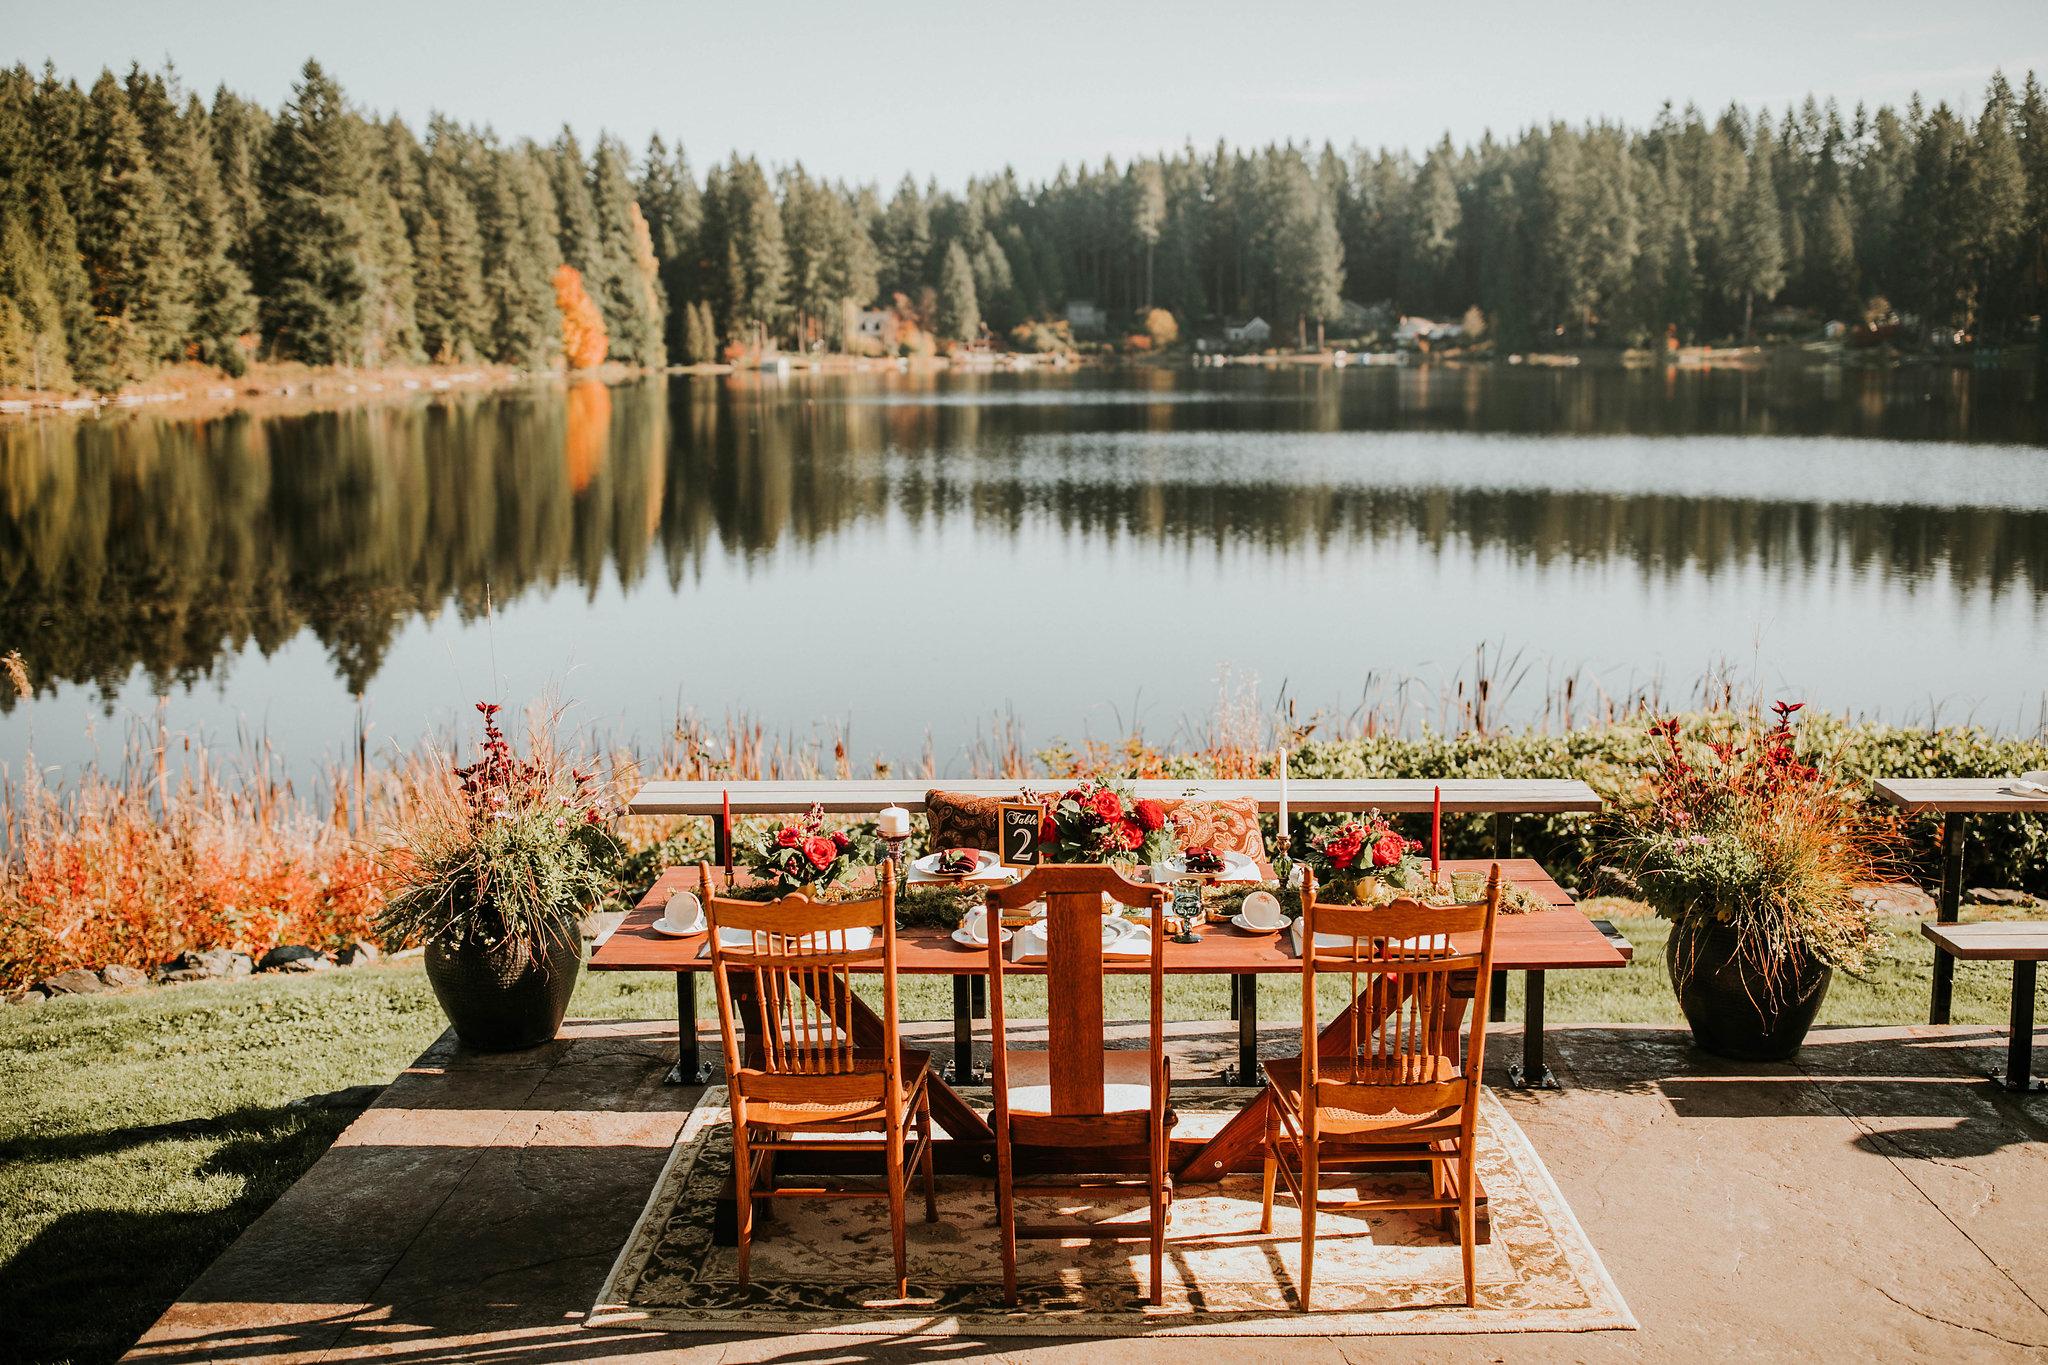 Crystal_Lake_lodge_Wedding_photos_by_Adina_Preston_Weddings_502.jpg